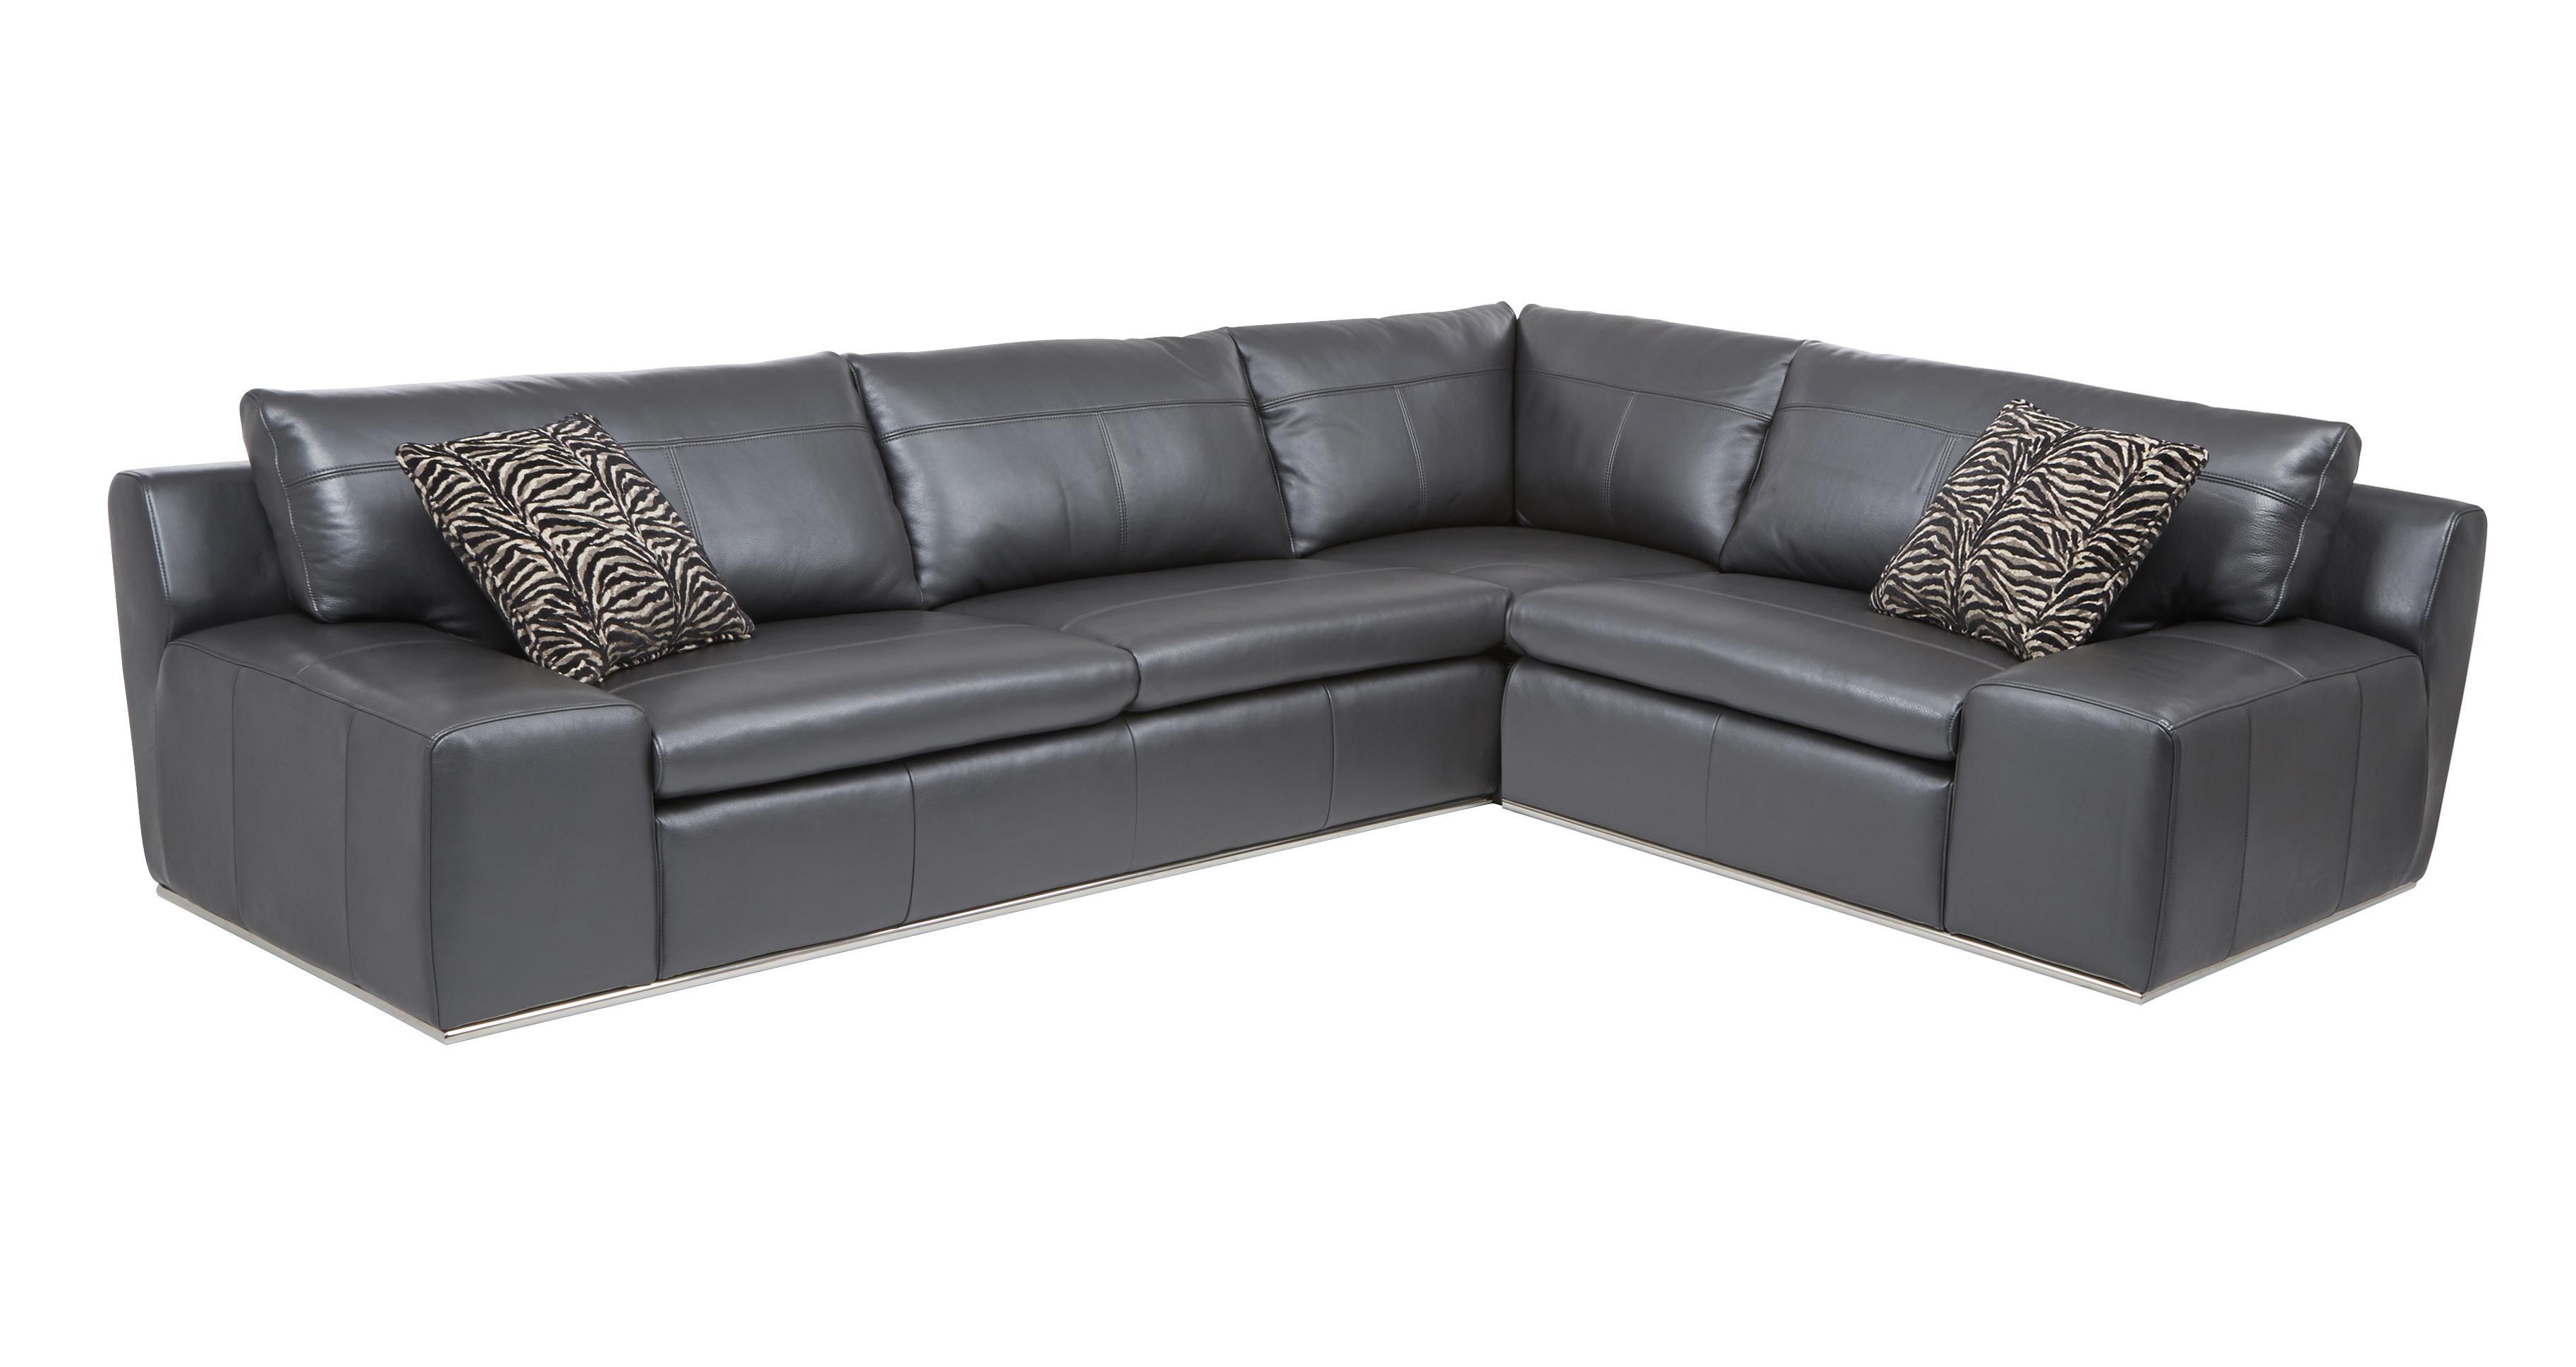 palladium option a left hand facing 2 seater corner sofa. Black Bedroom Furniture Sets. Home Design Ideas